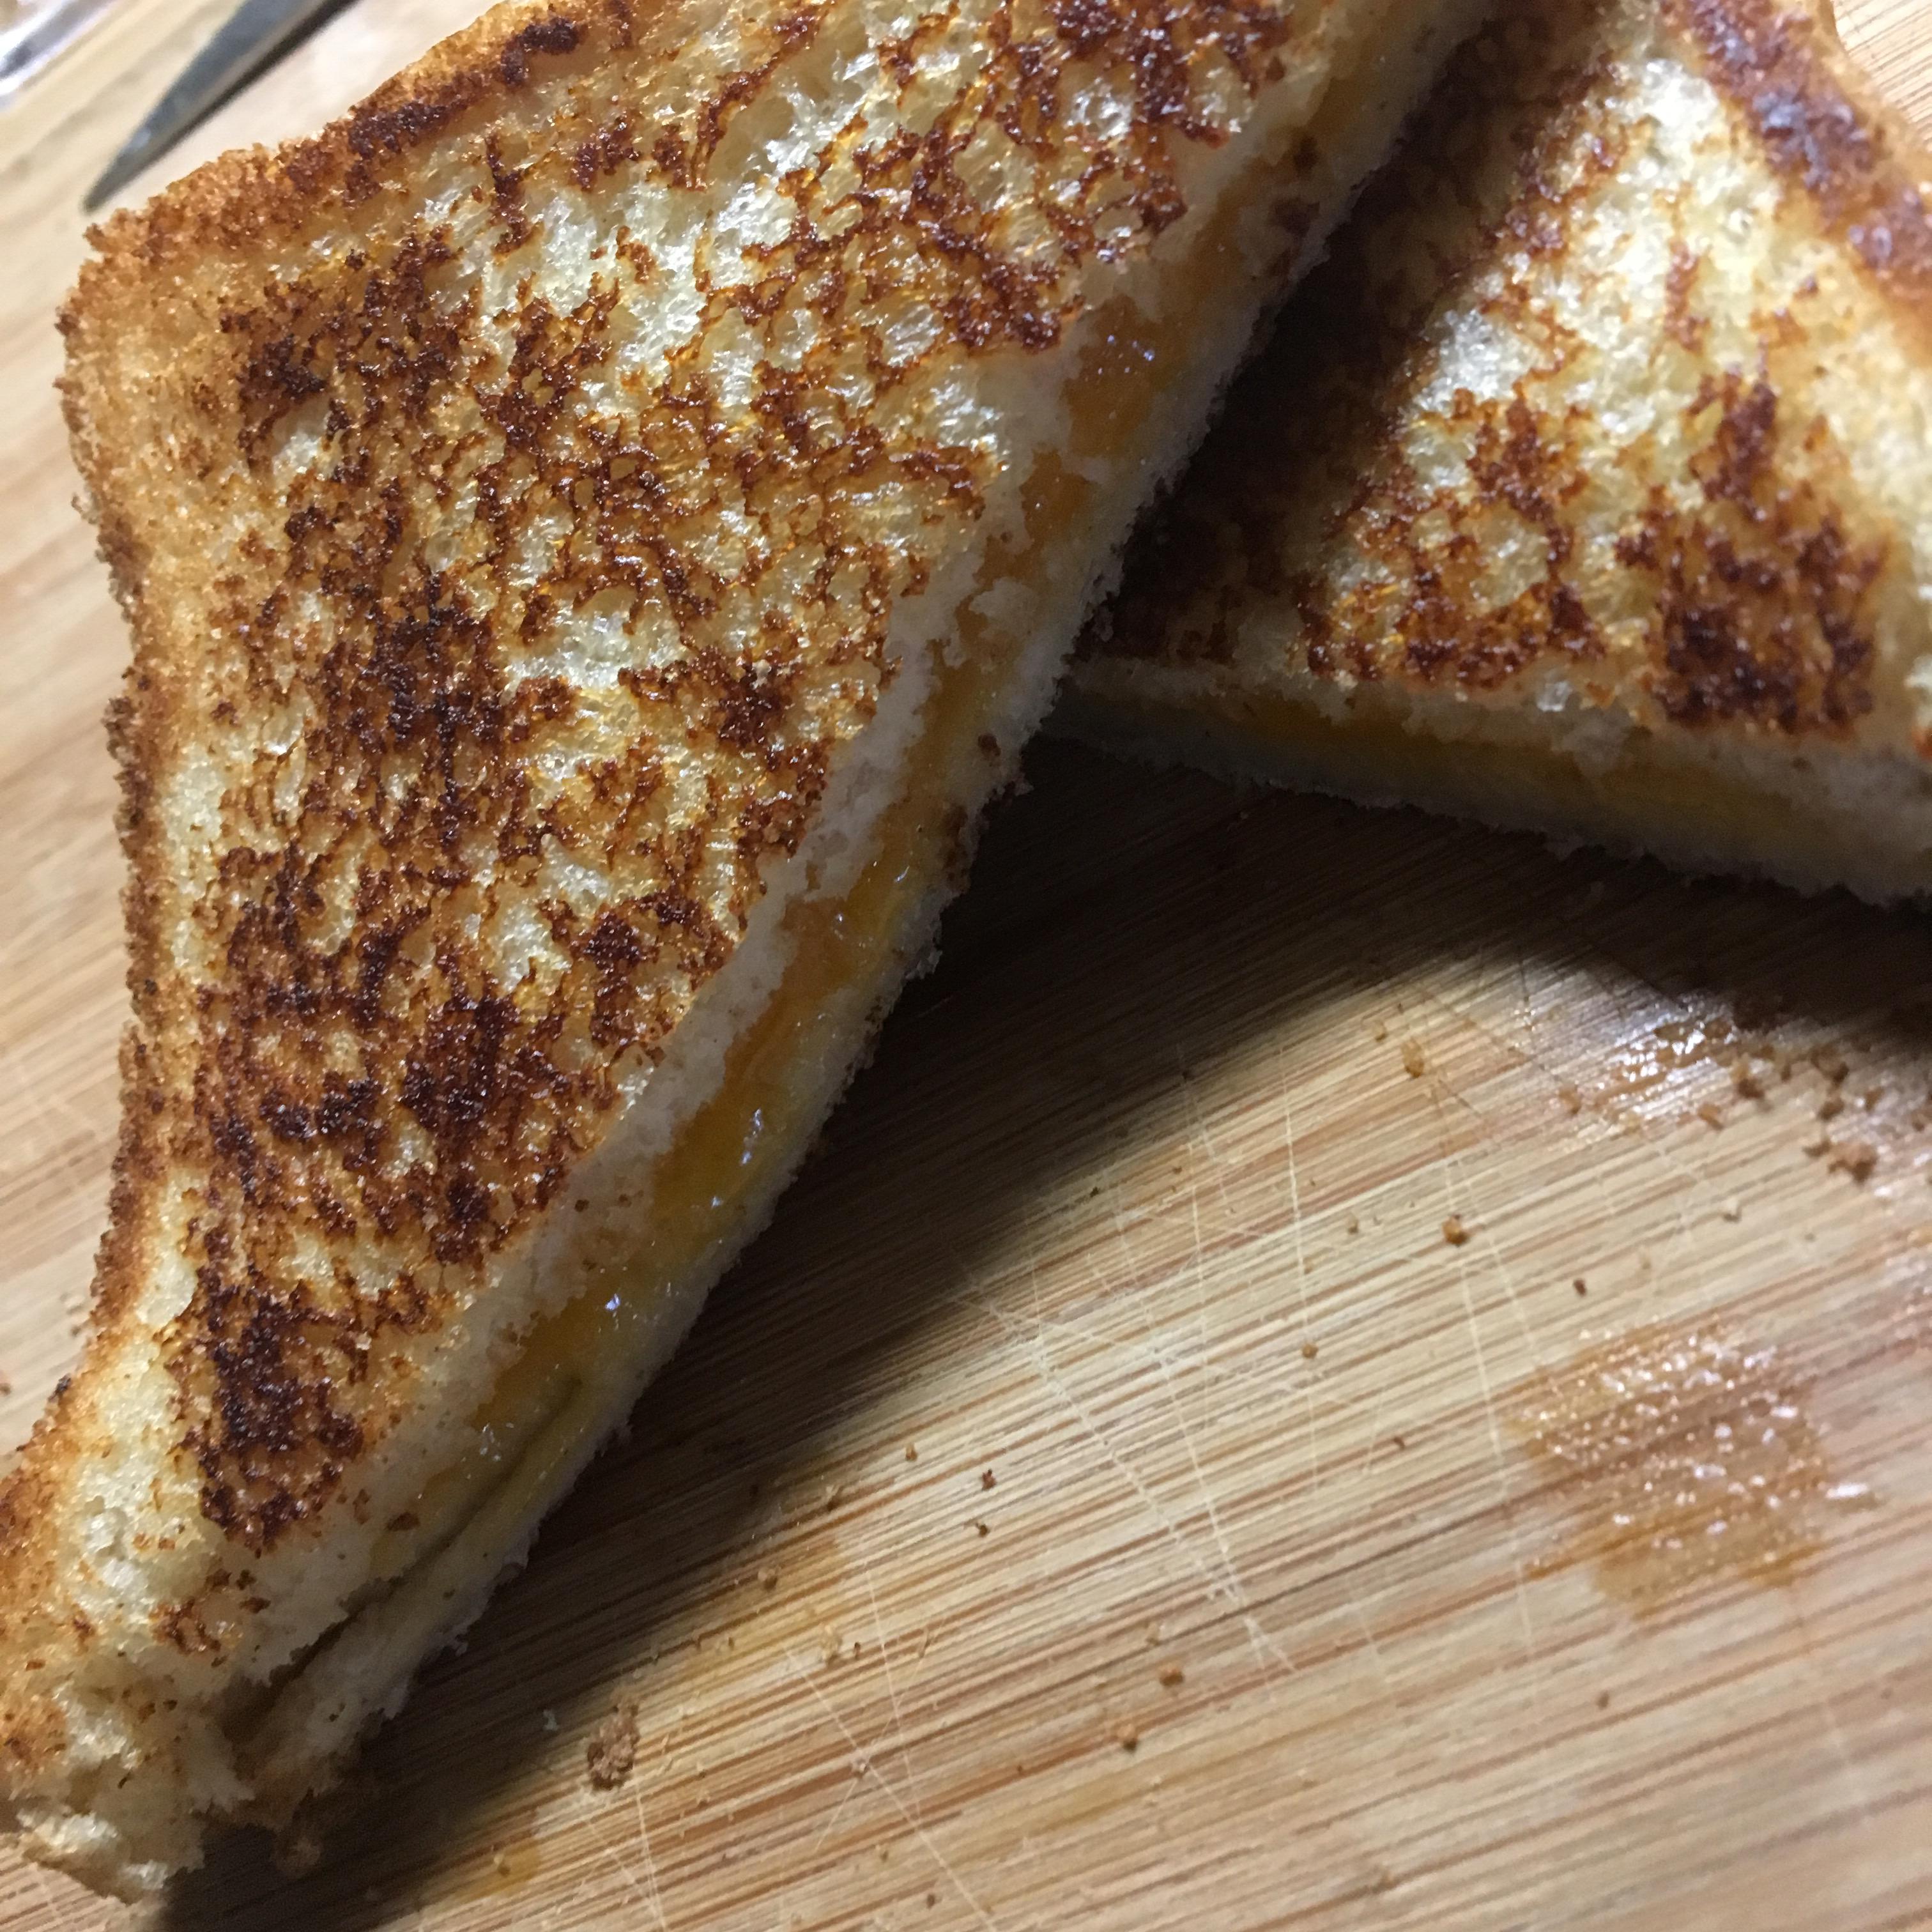 Grilled Cheese Sandwich krunk805